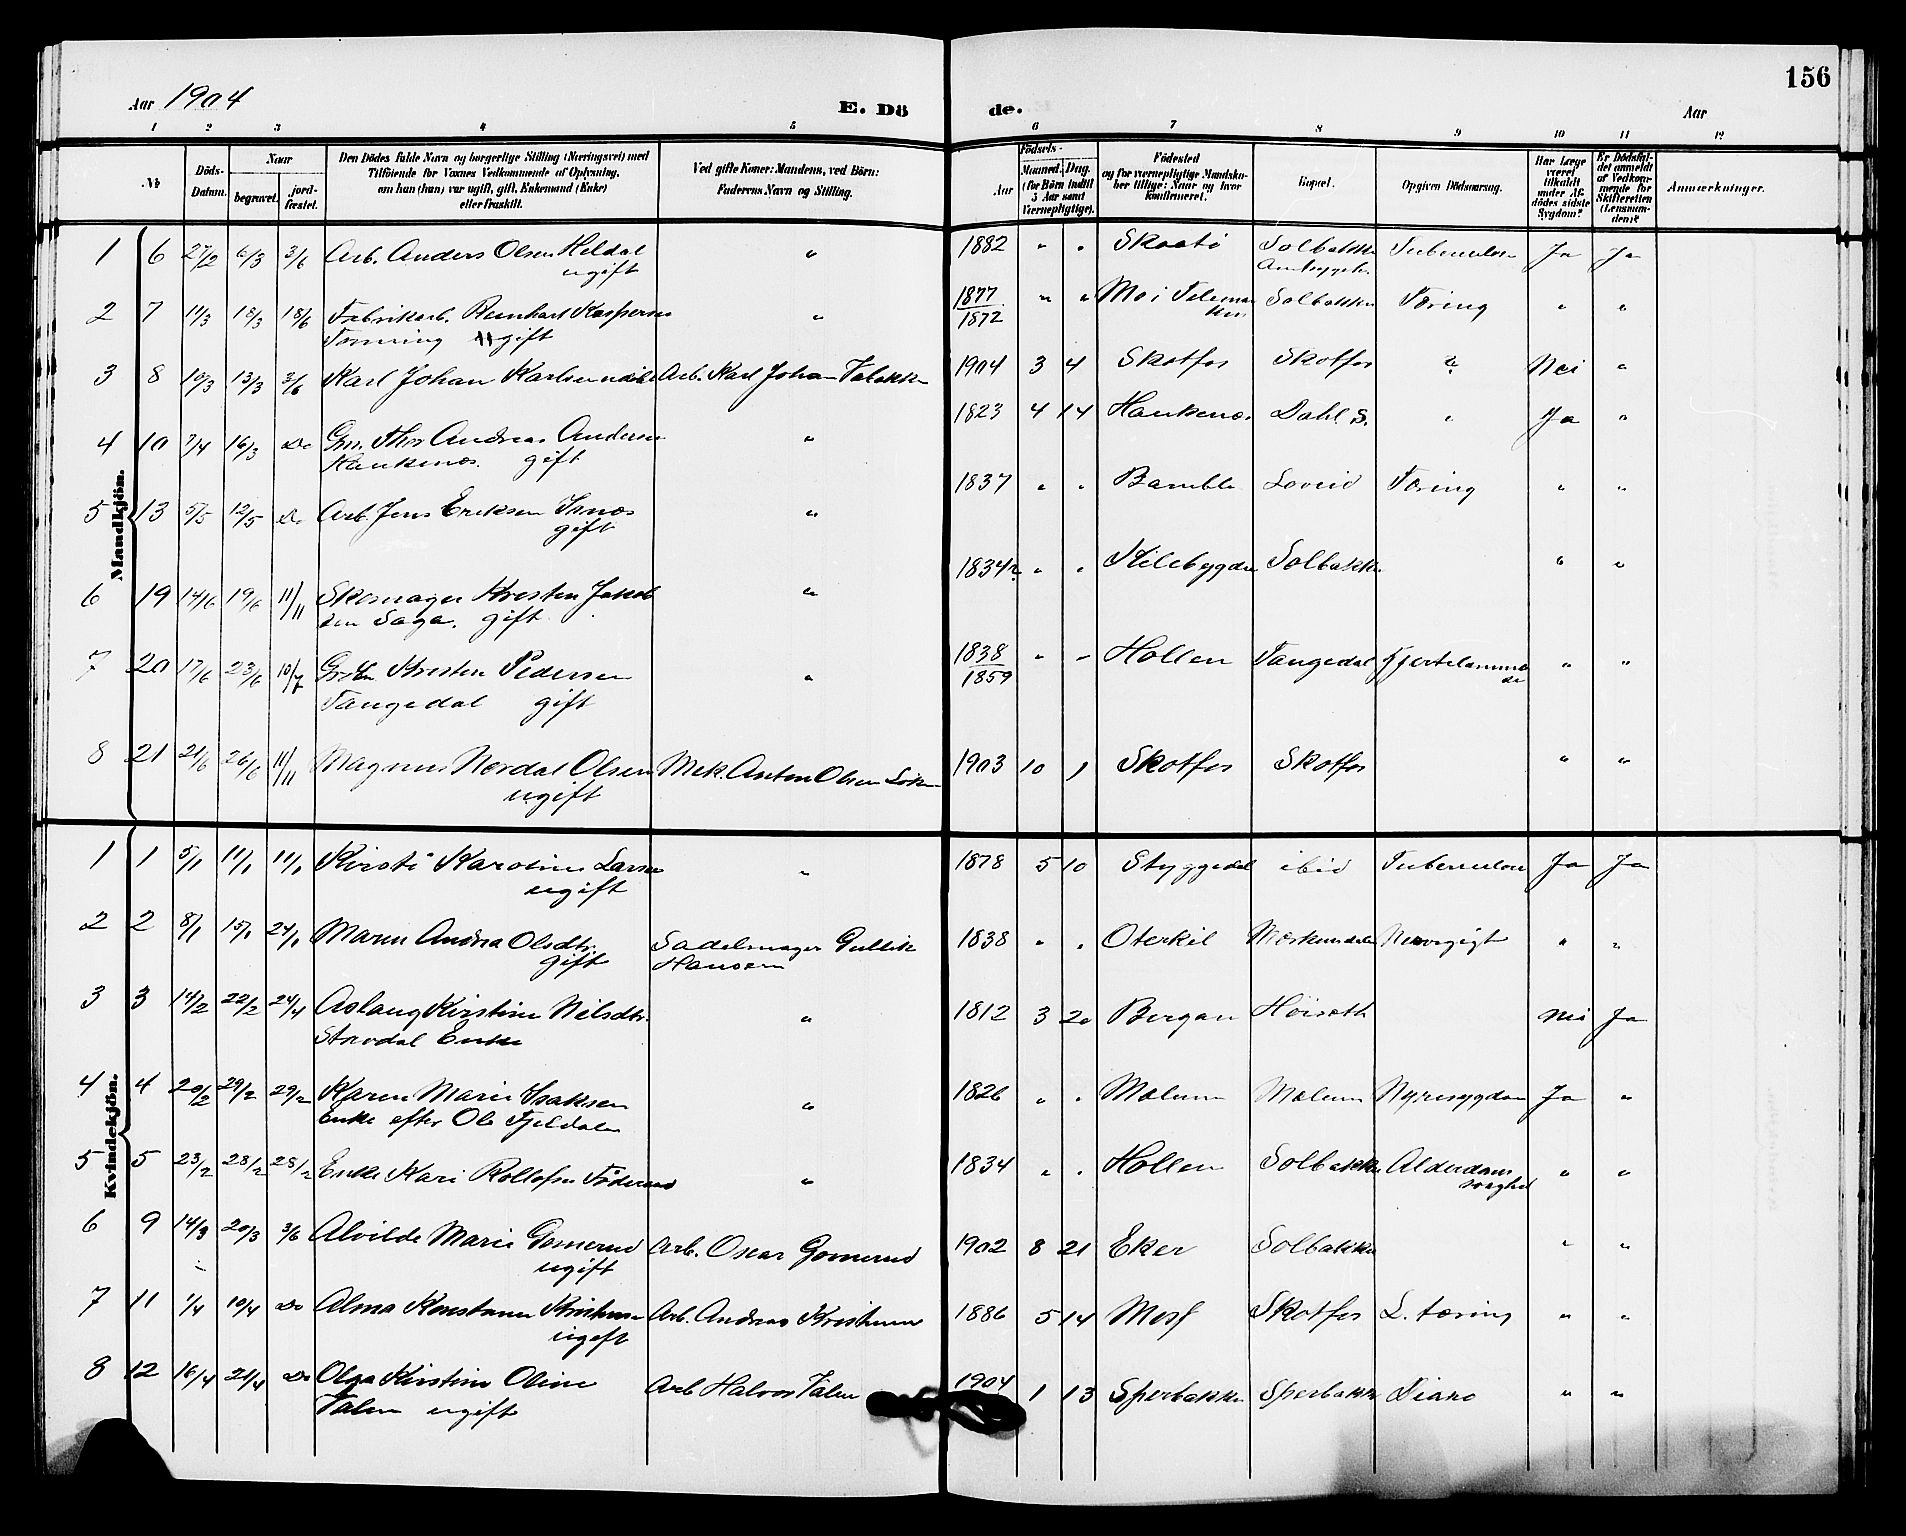 SAKO, Solum kirkebøker, G/Gb/L0004: Klokkerbok nr. II 4, 1898-1905, s. 156